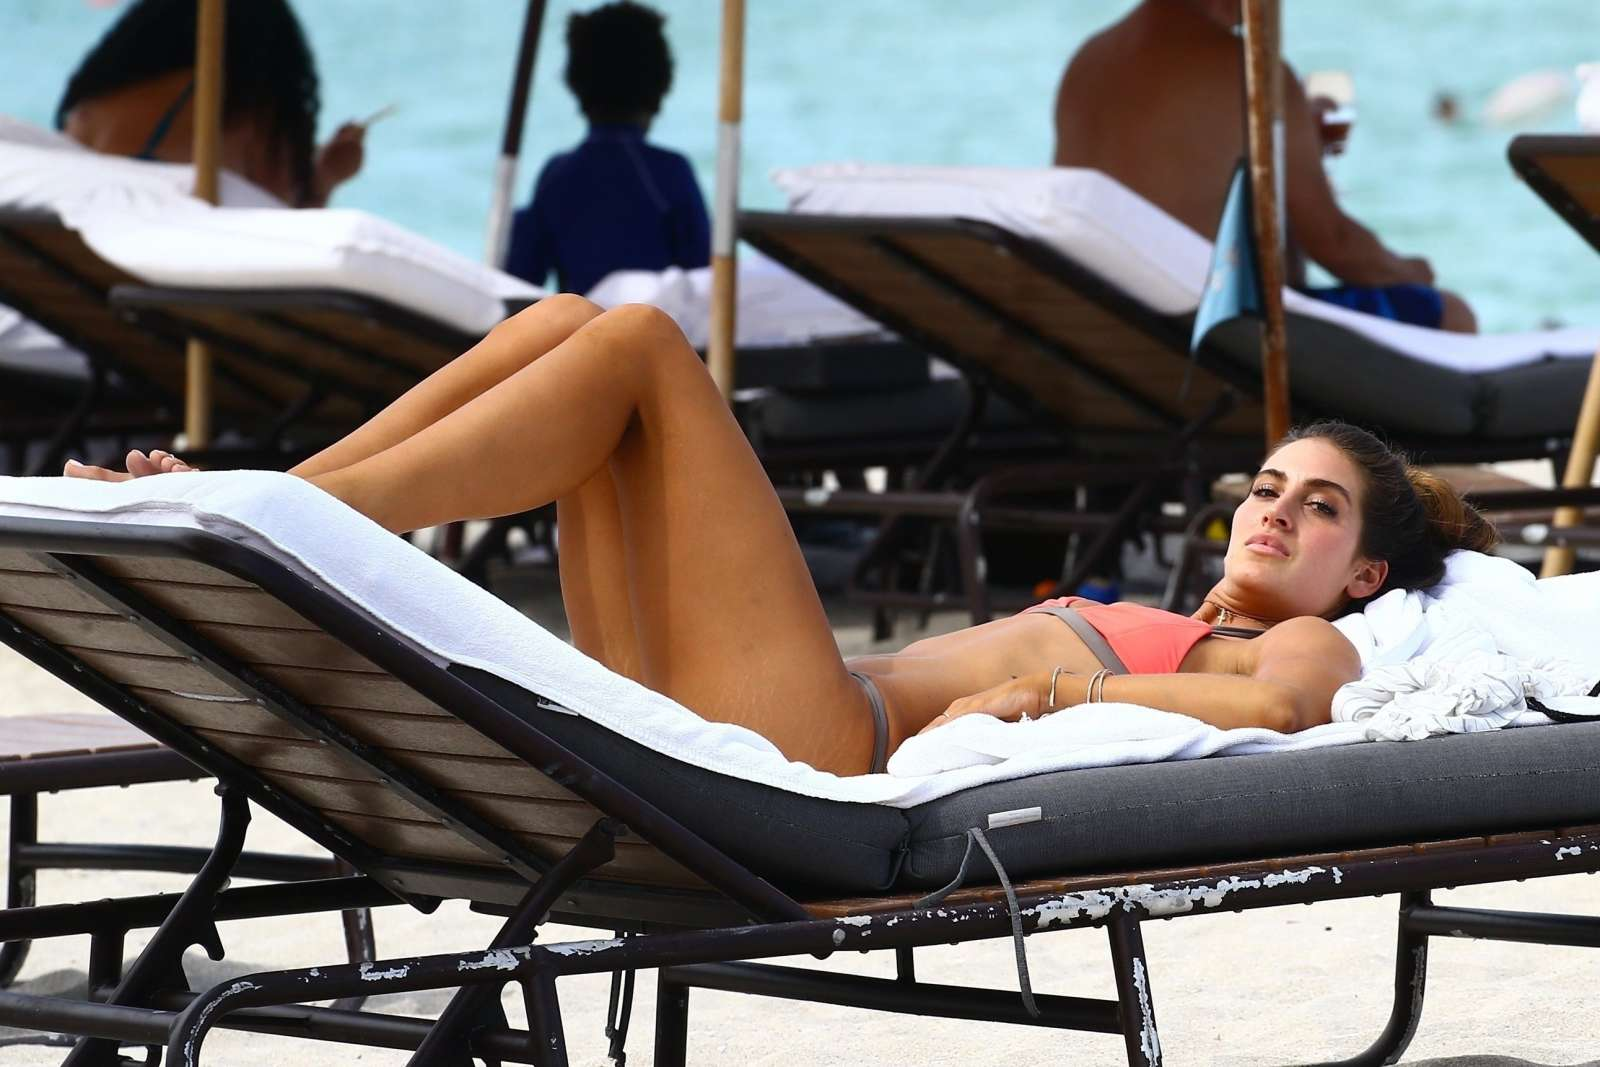 Bikini Kaylee Ricciardi naked (45 foto and video), Topless, Sideboobs, Boobs, butt 2019